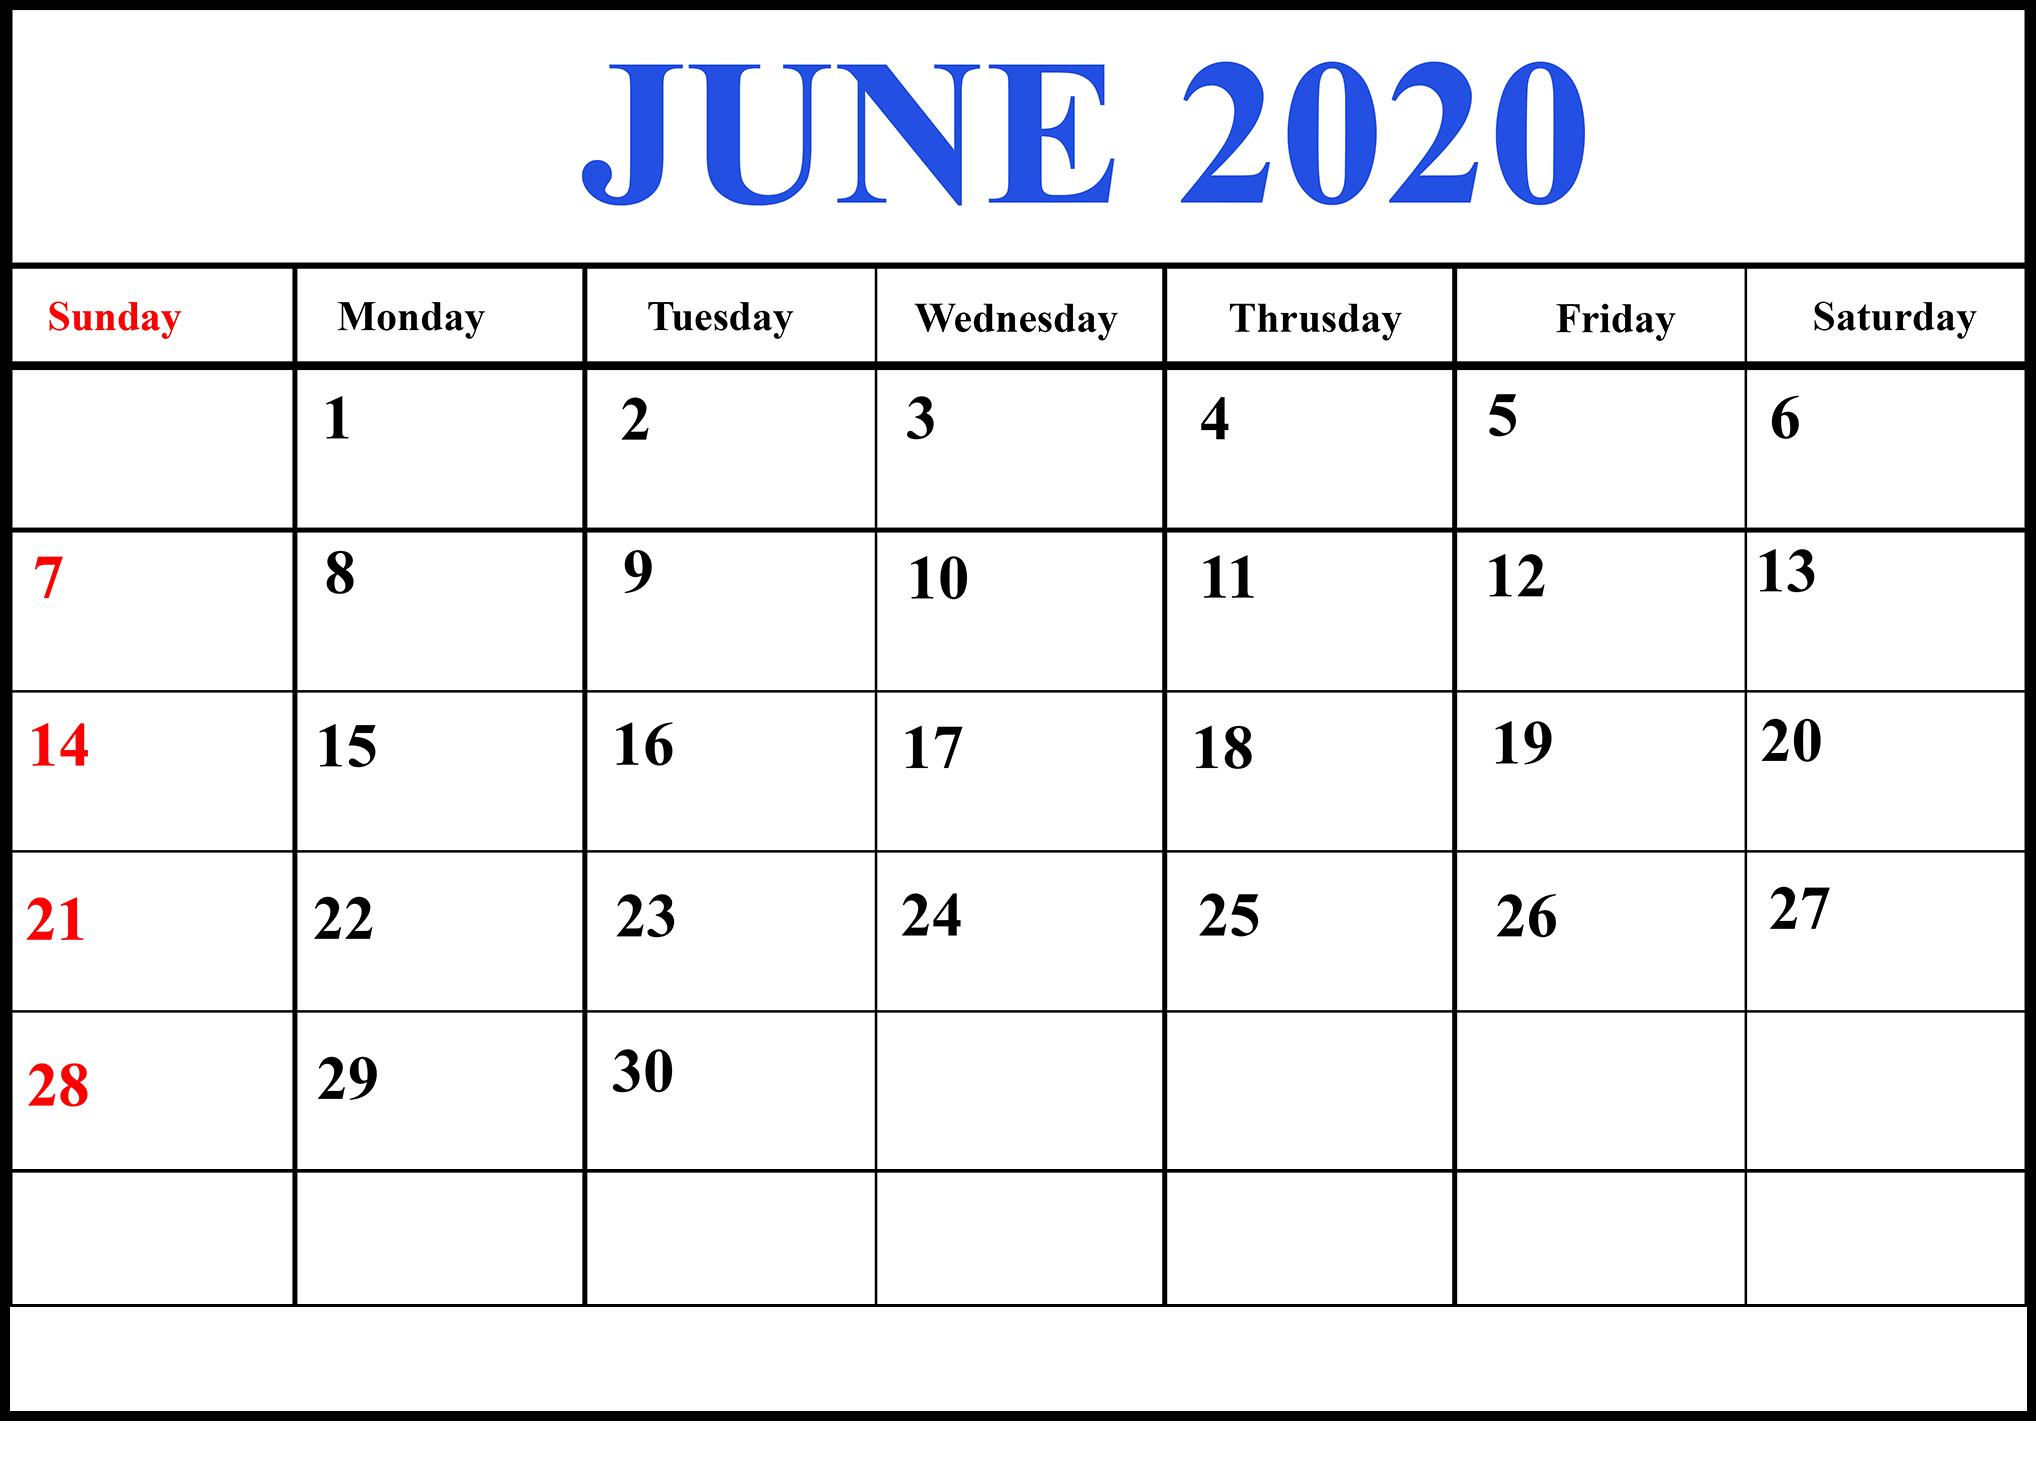 Free June 2020 Calendar Excel